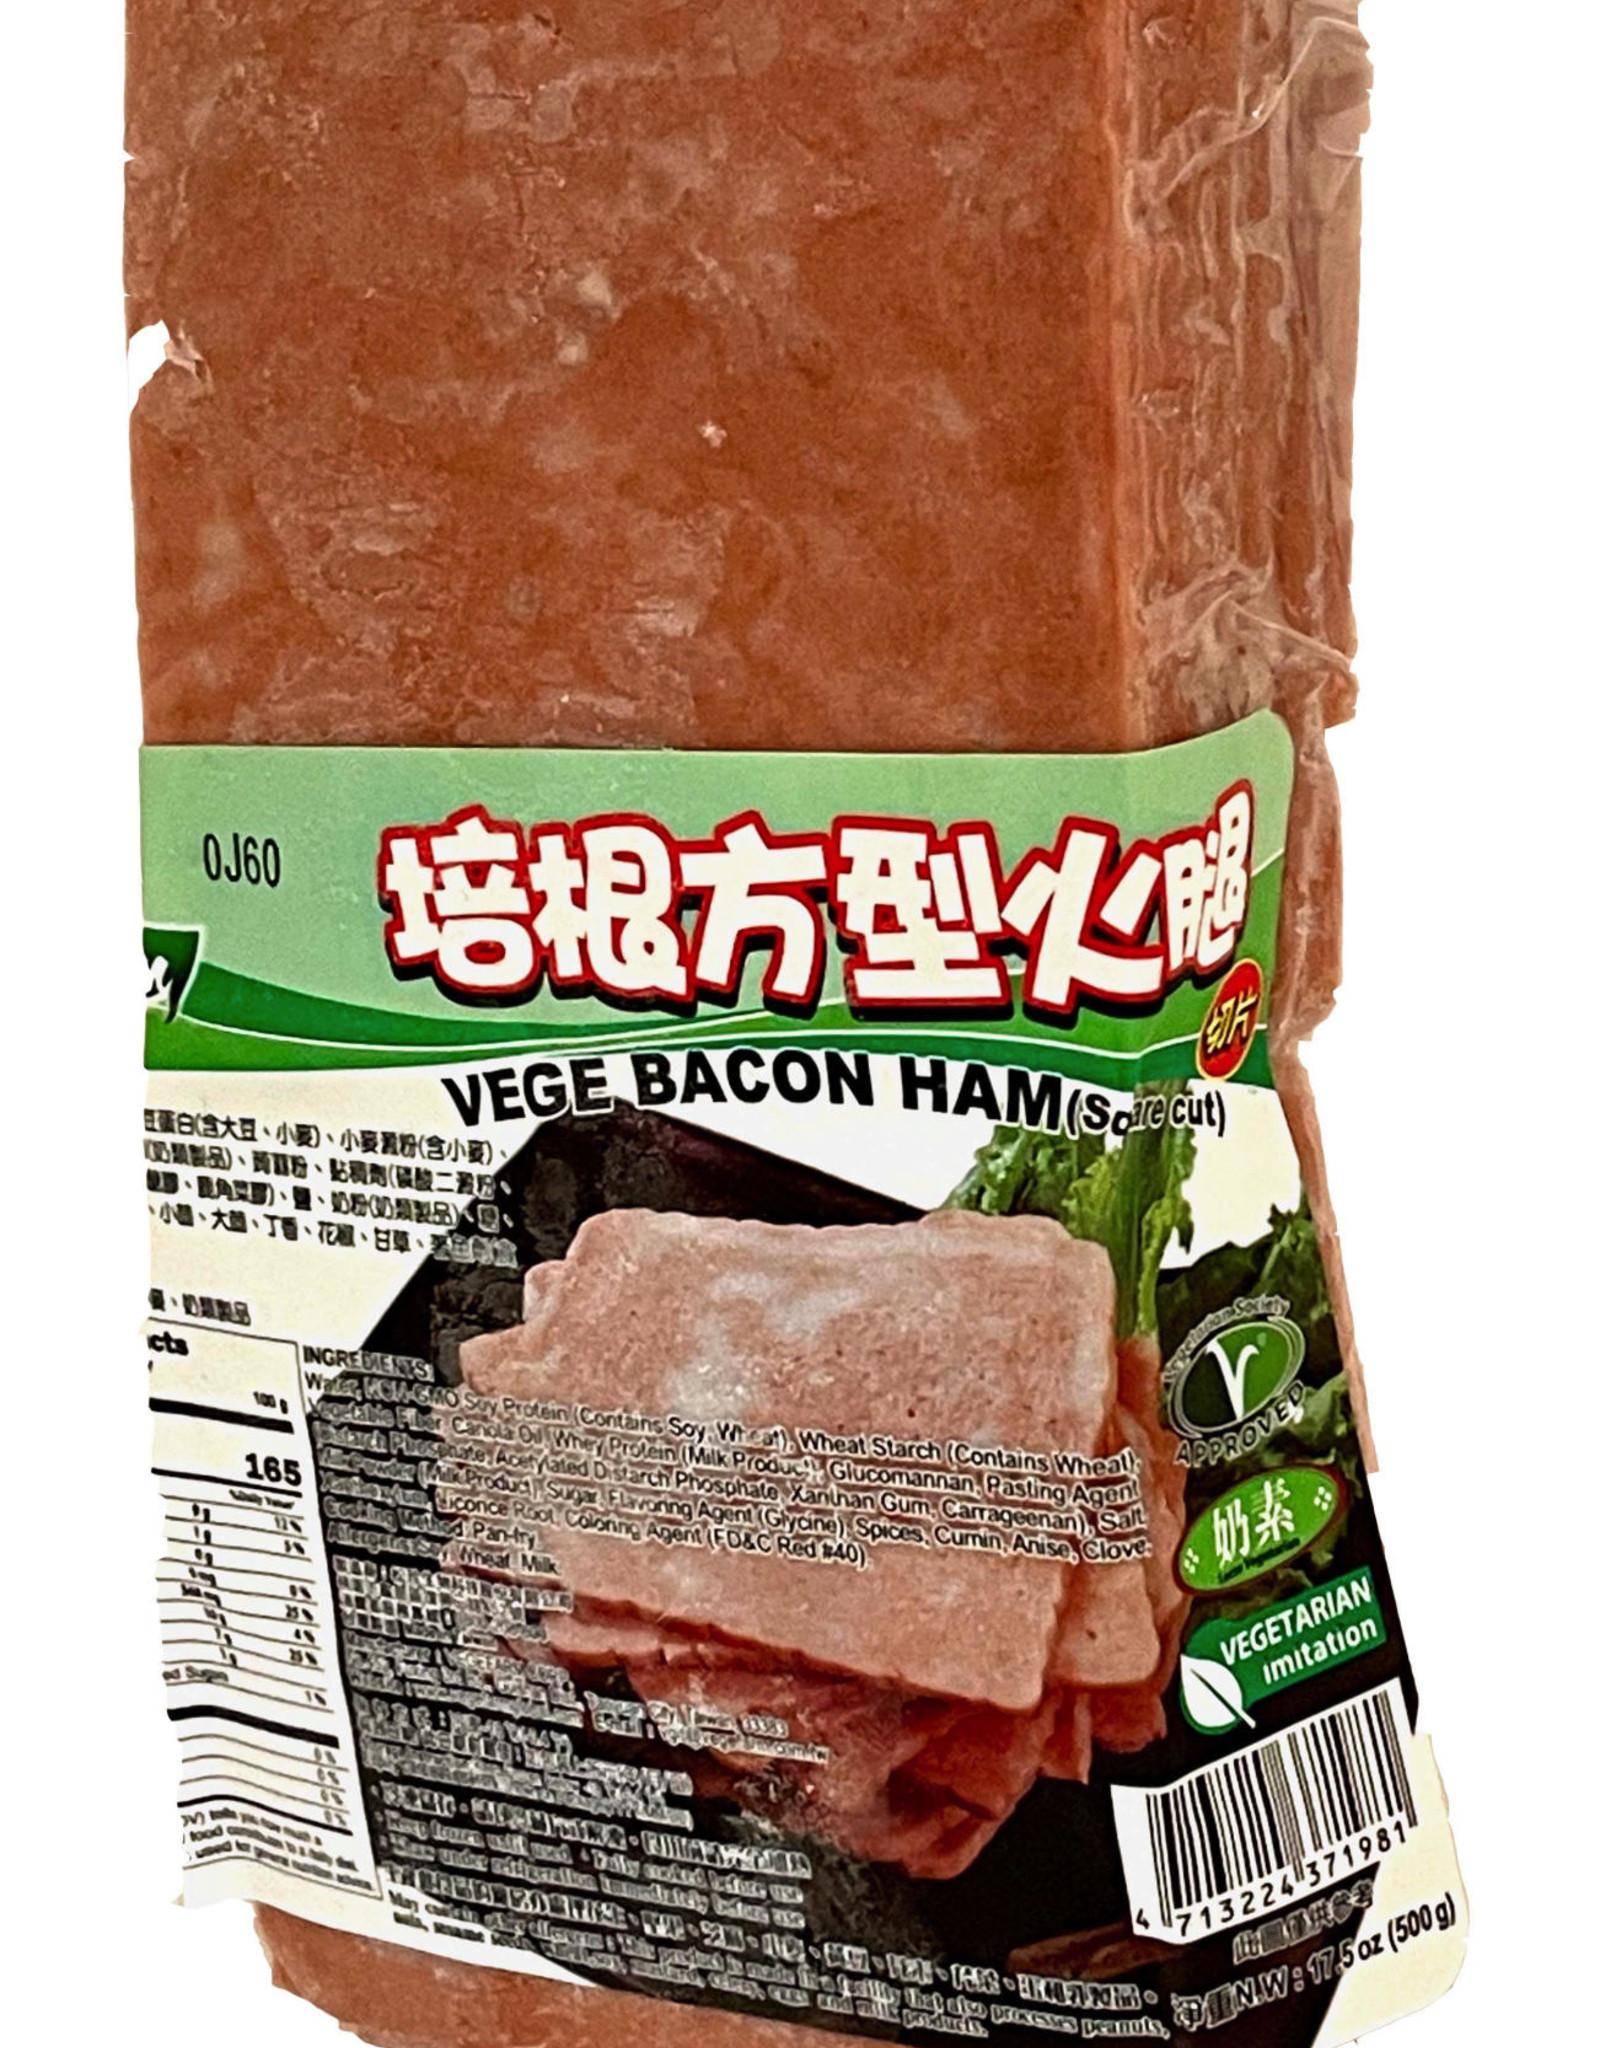 Vegefarm * 松珍 (VF) Vege Sliced Bacon Ham*(松珍) 素培根方型火腿